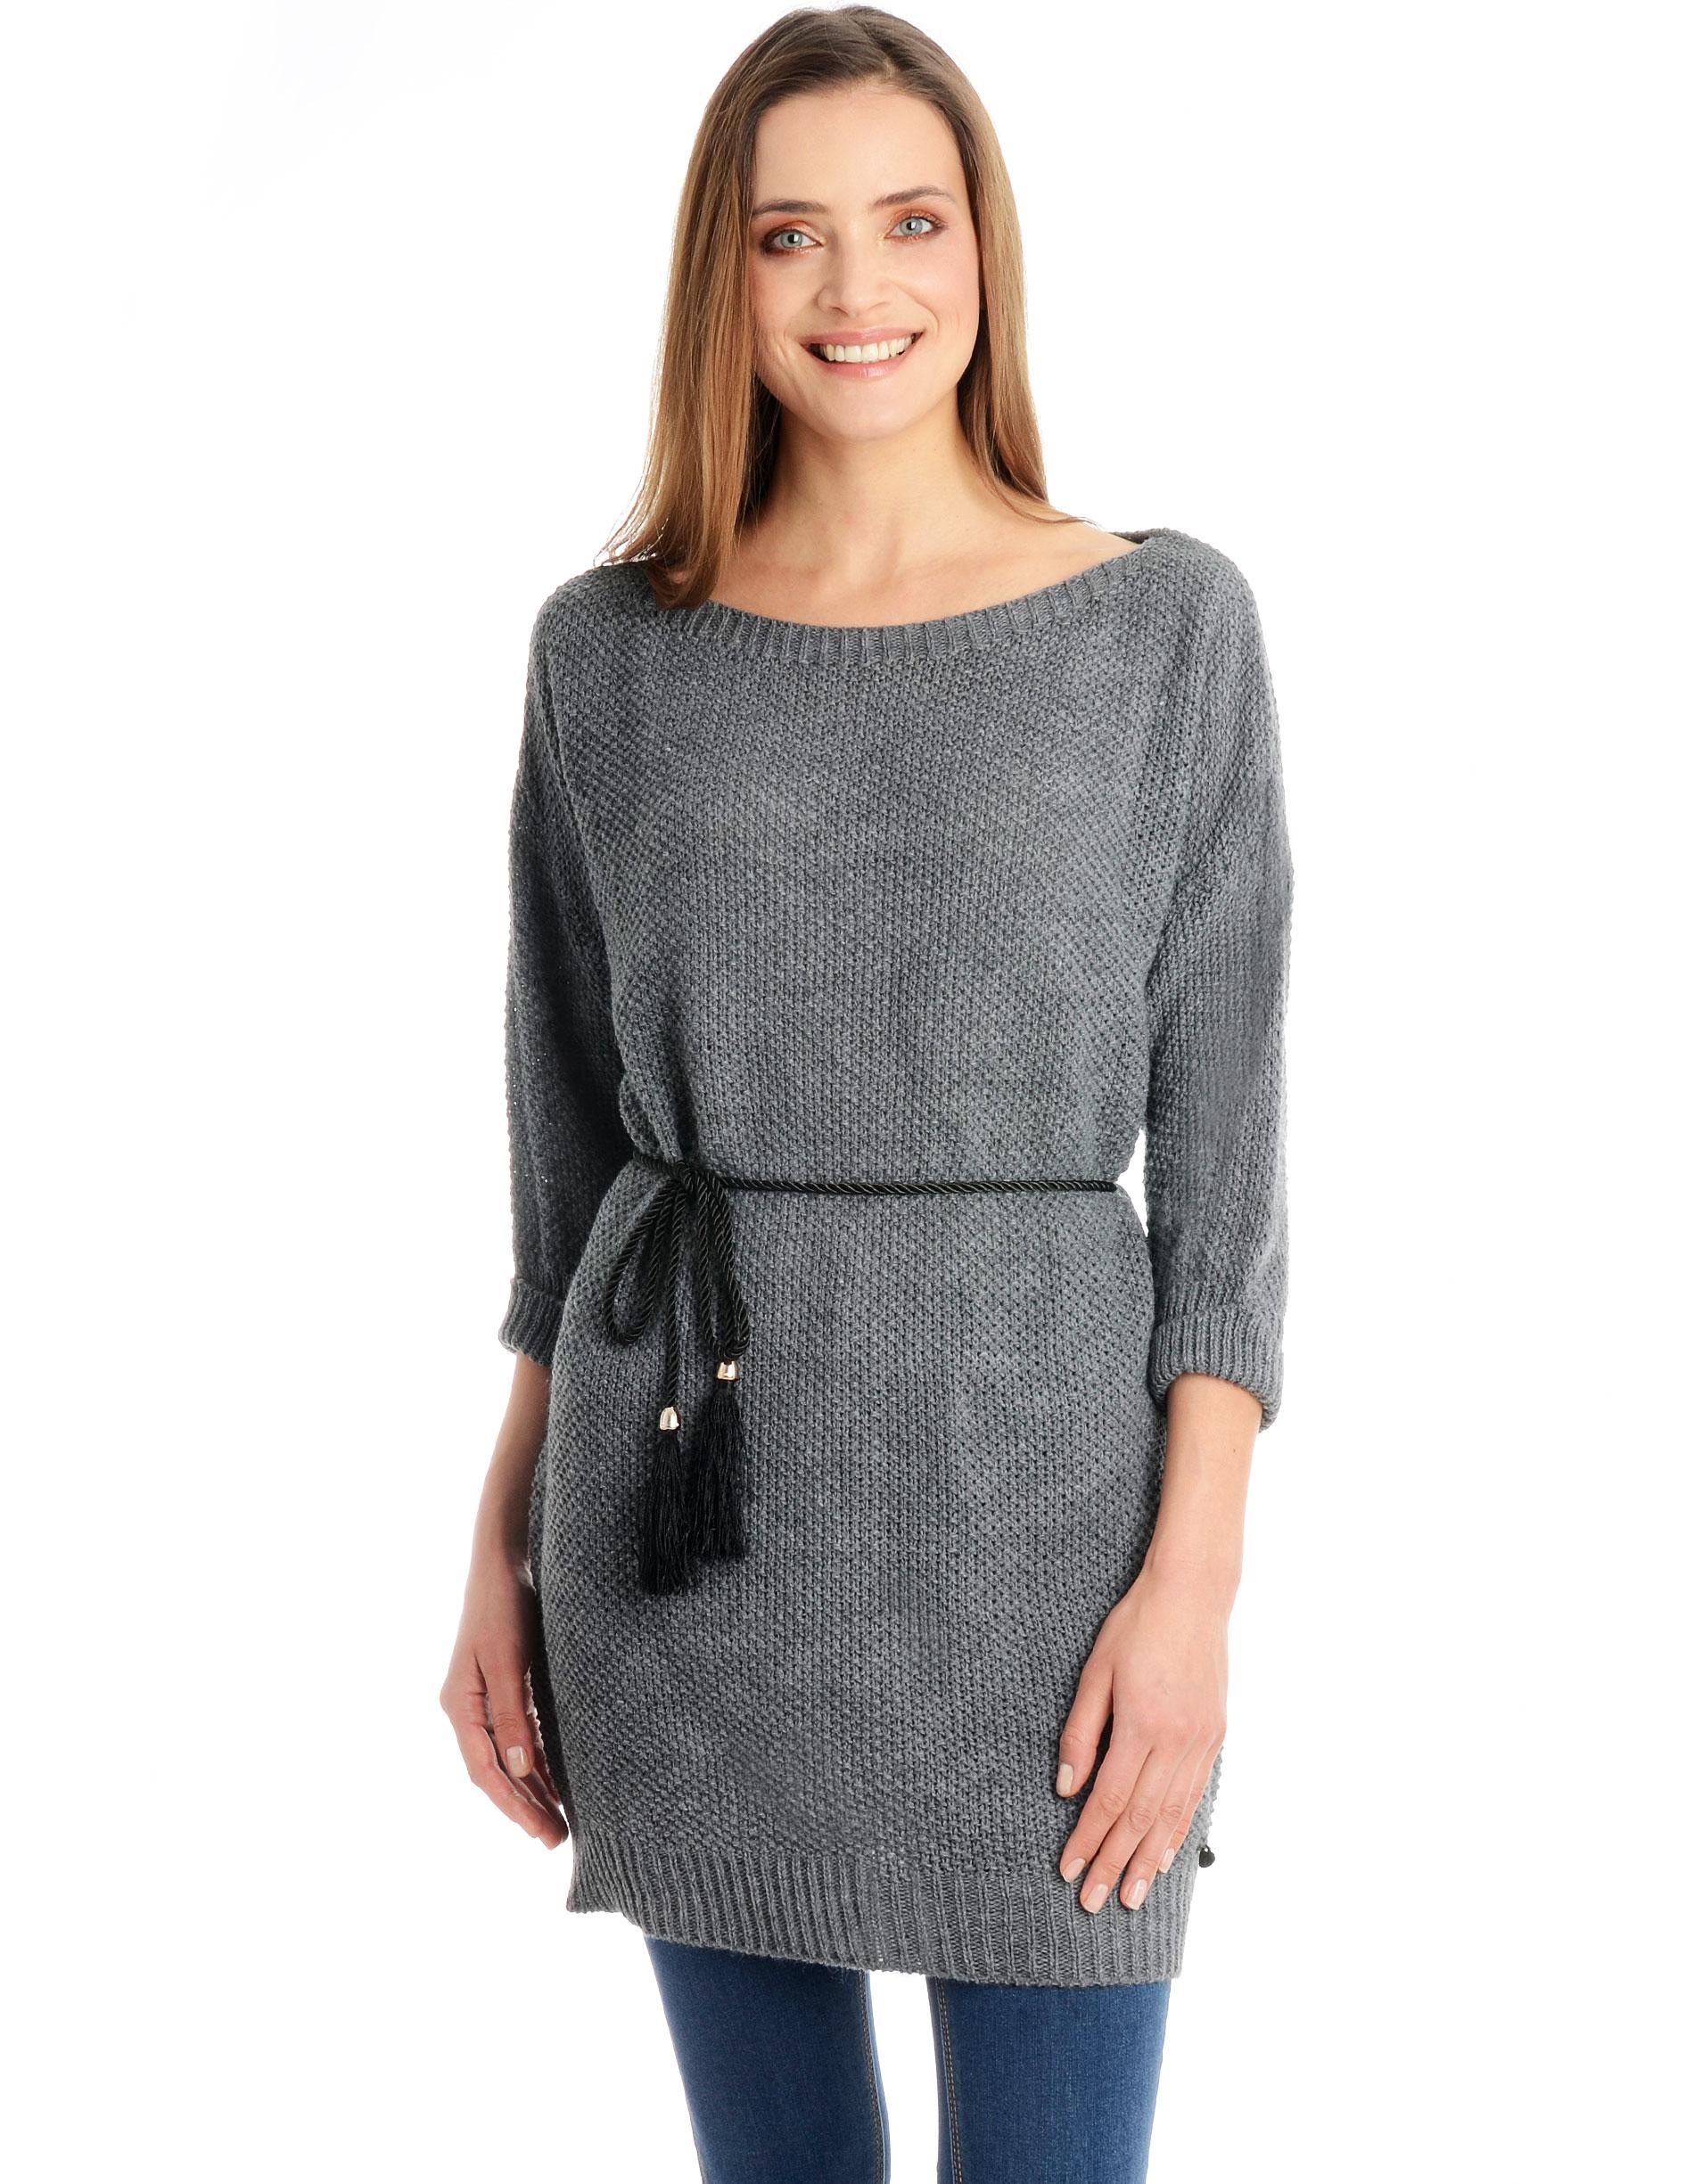 Sweter - 4-5013 GRI SC - Unisono